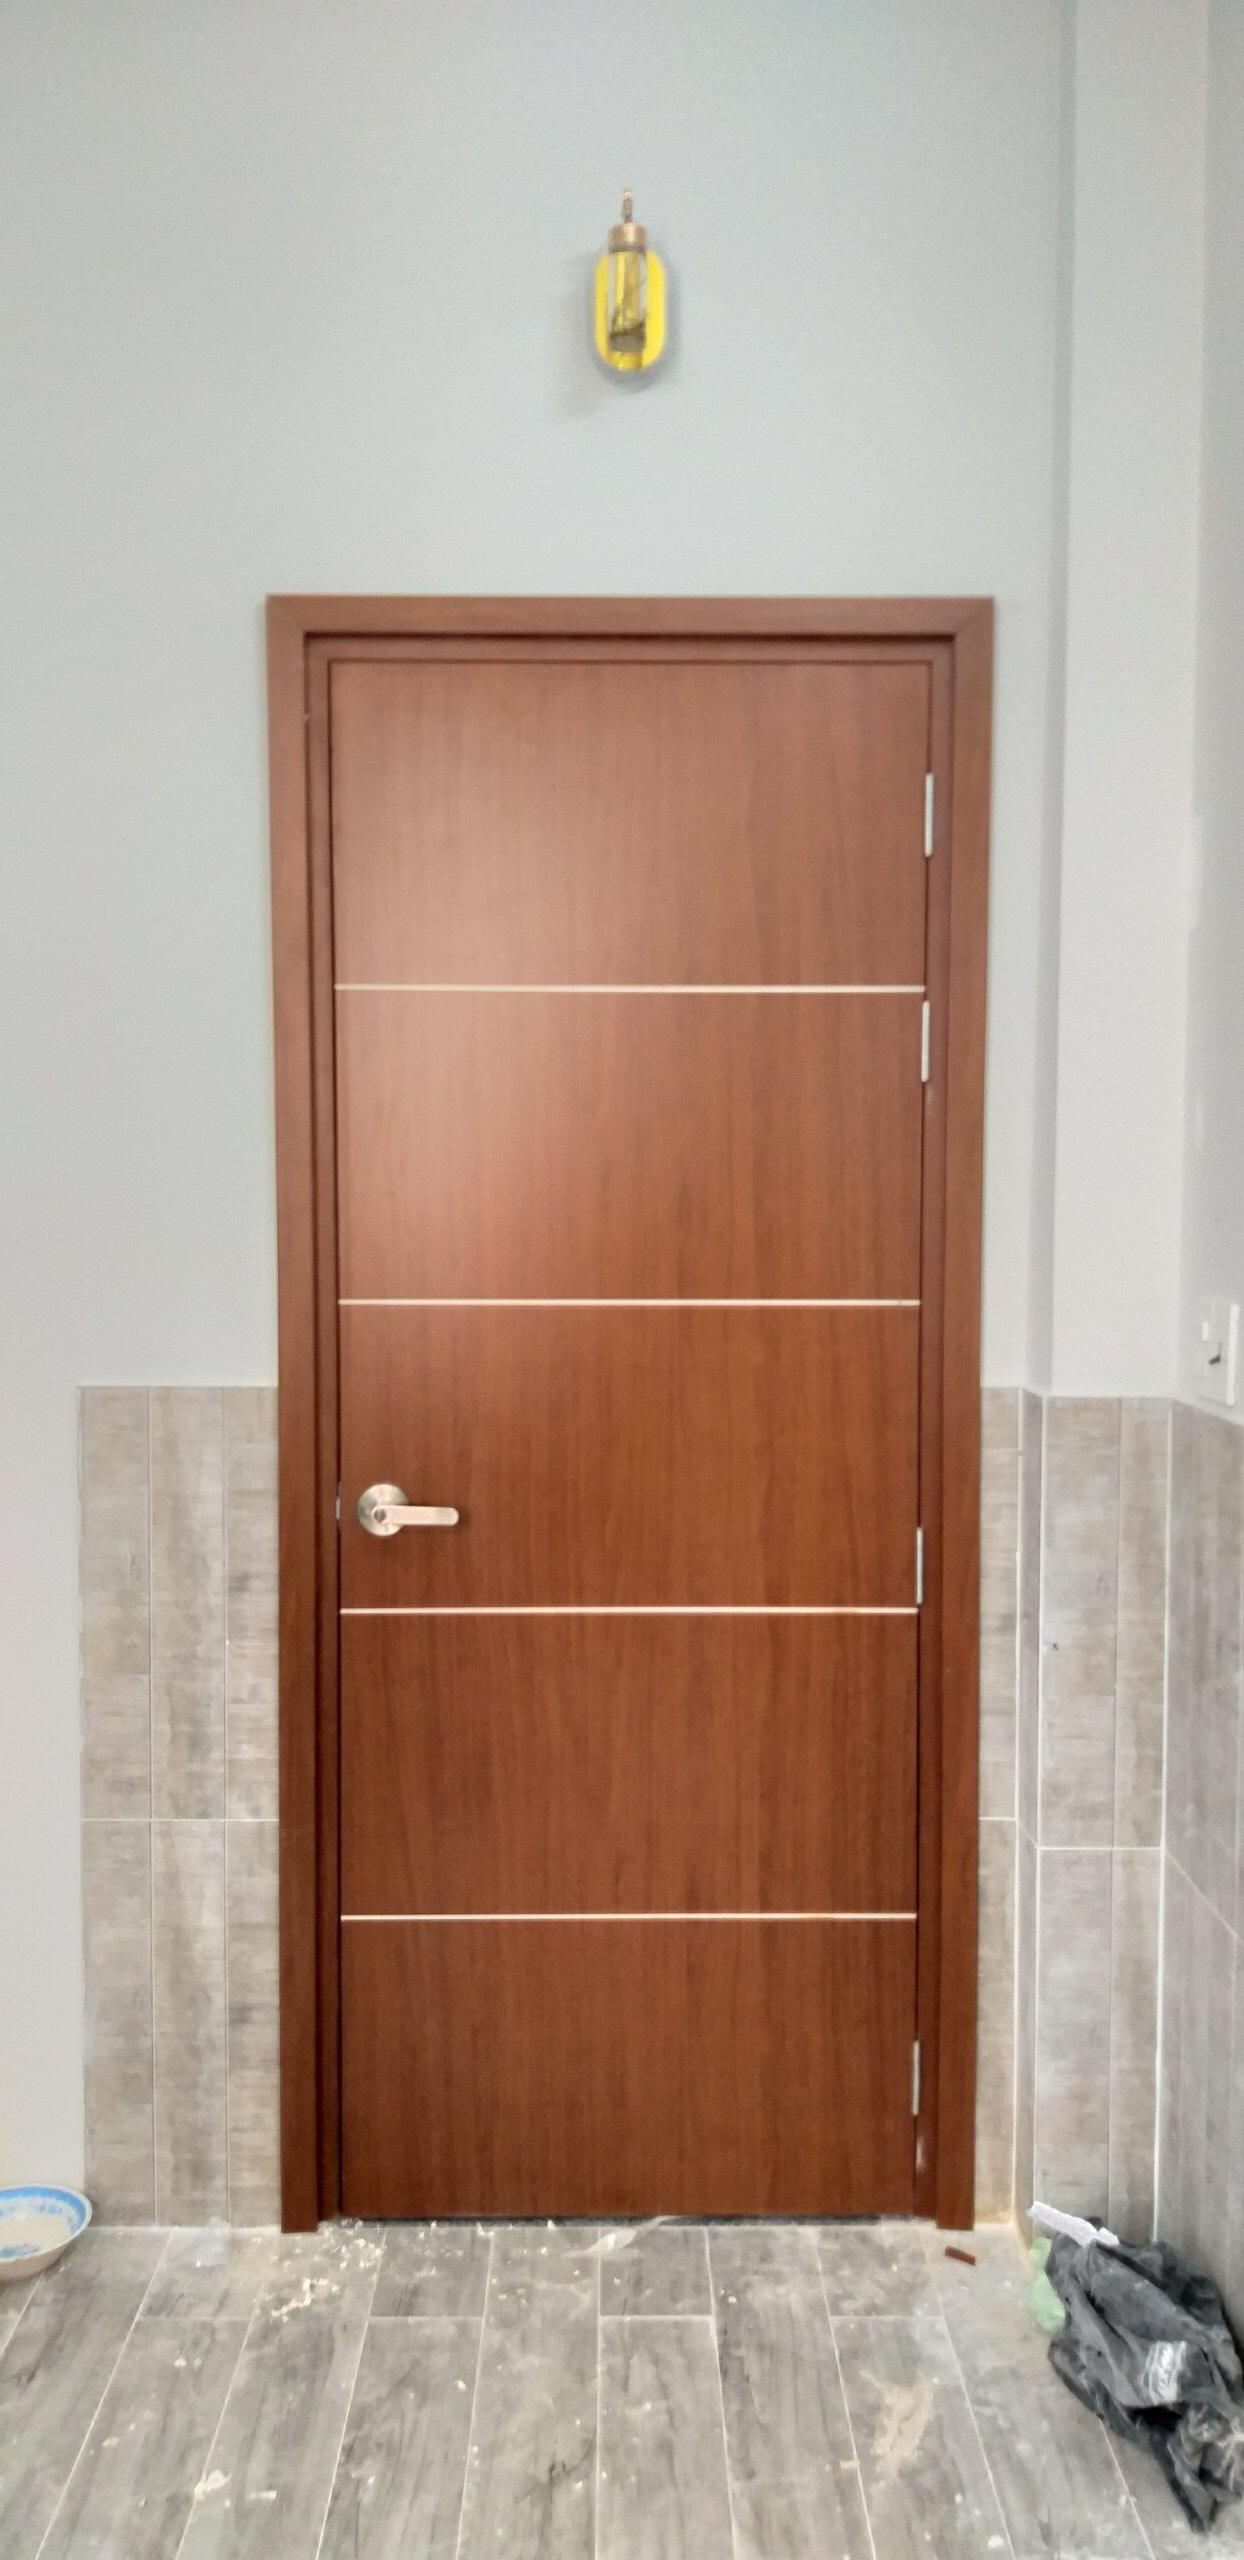 Cửa nhựa gỗ Composite mẫu mới